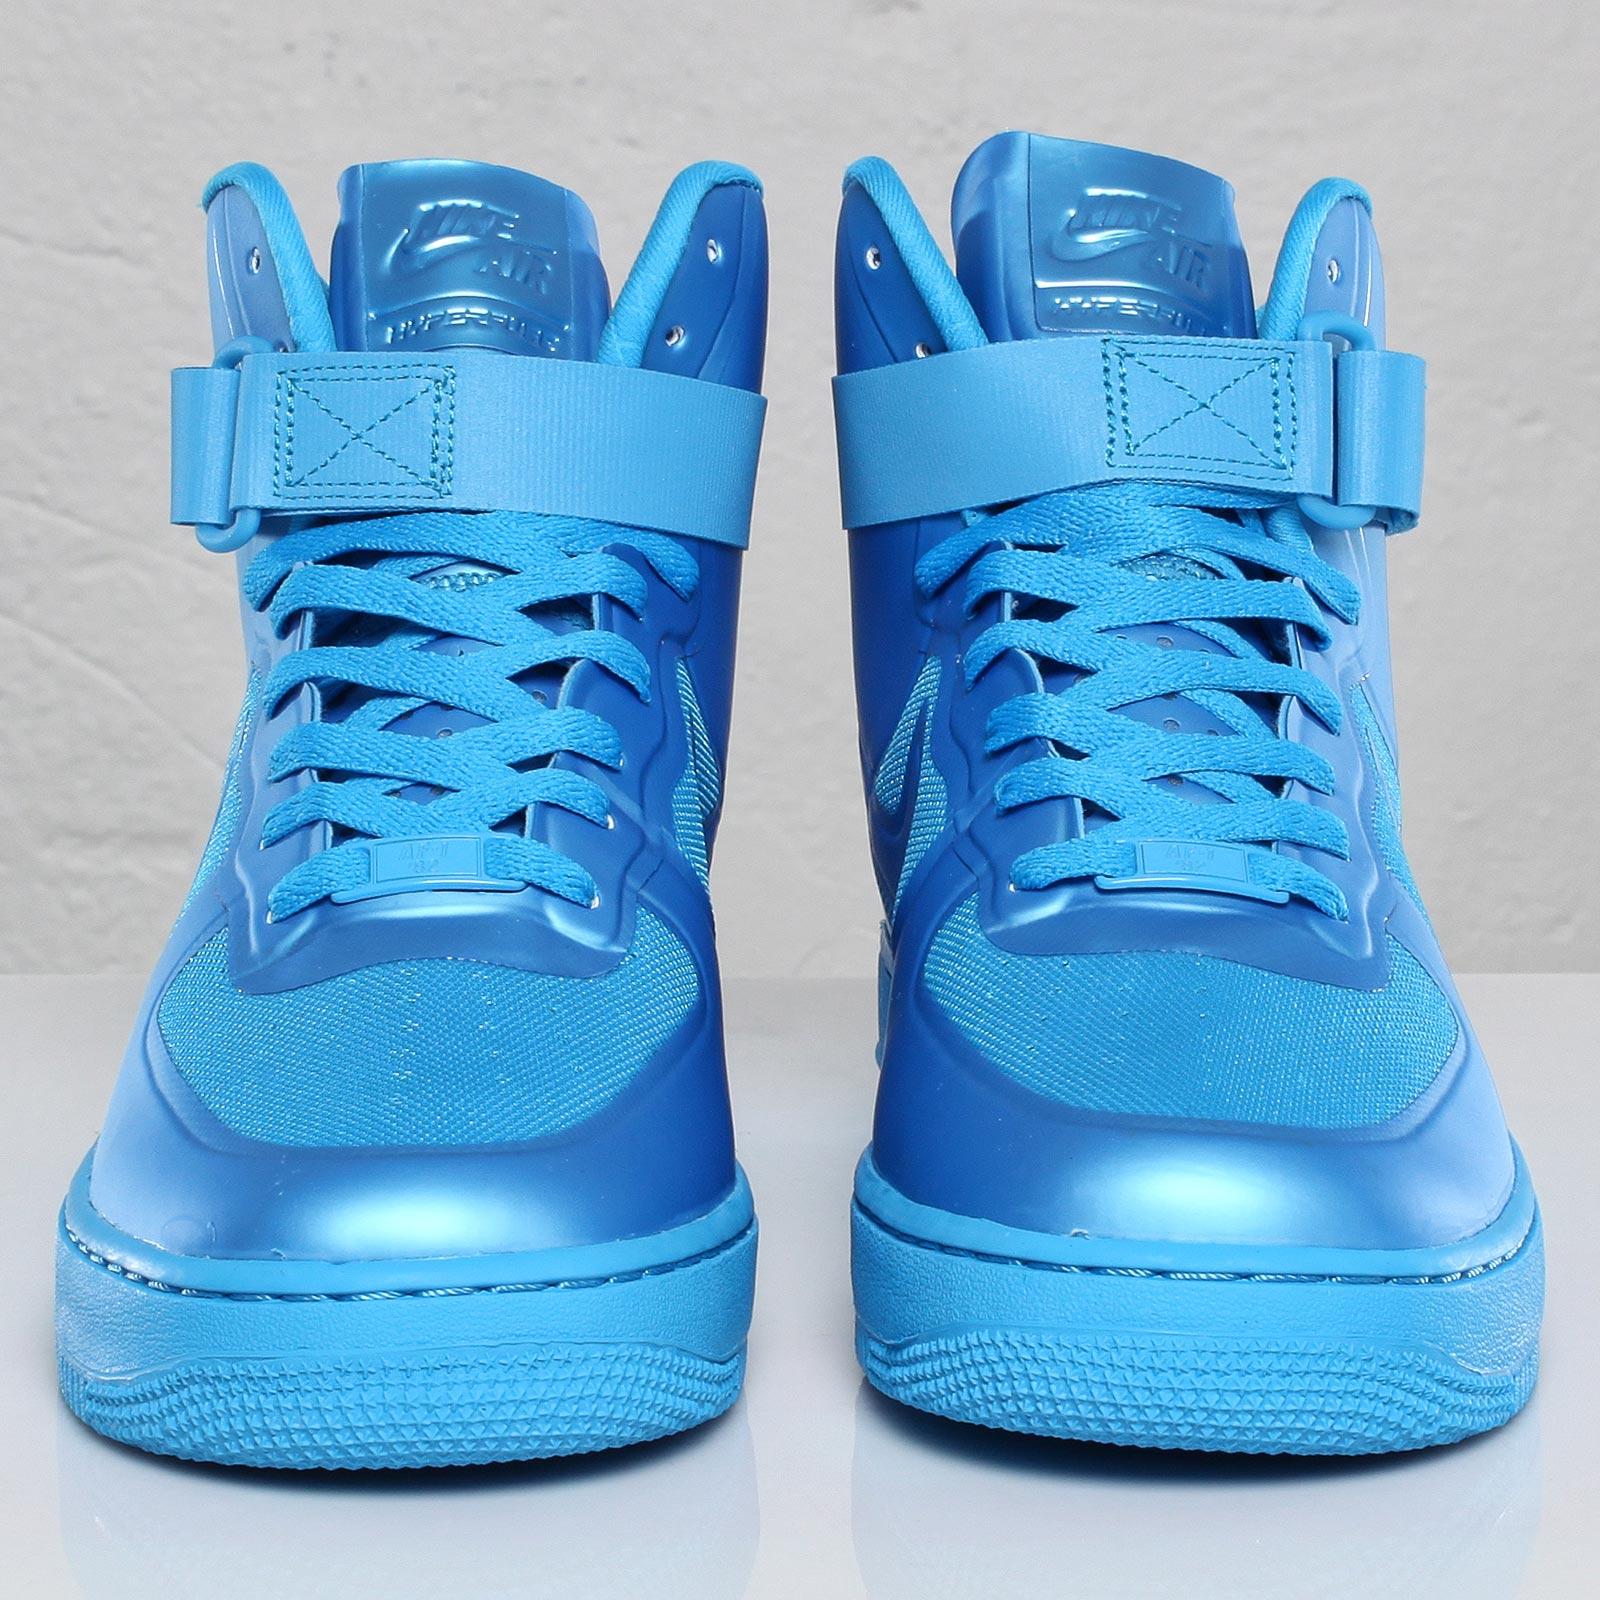 Force Hyp Nike Hi Prm 1 Air 101867 SneakersnstuffSneakers vN8nO0mw